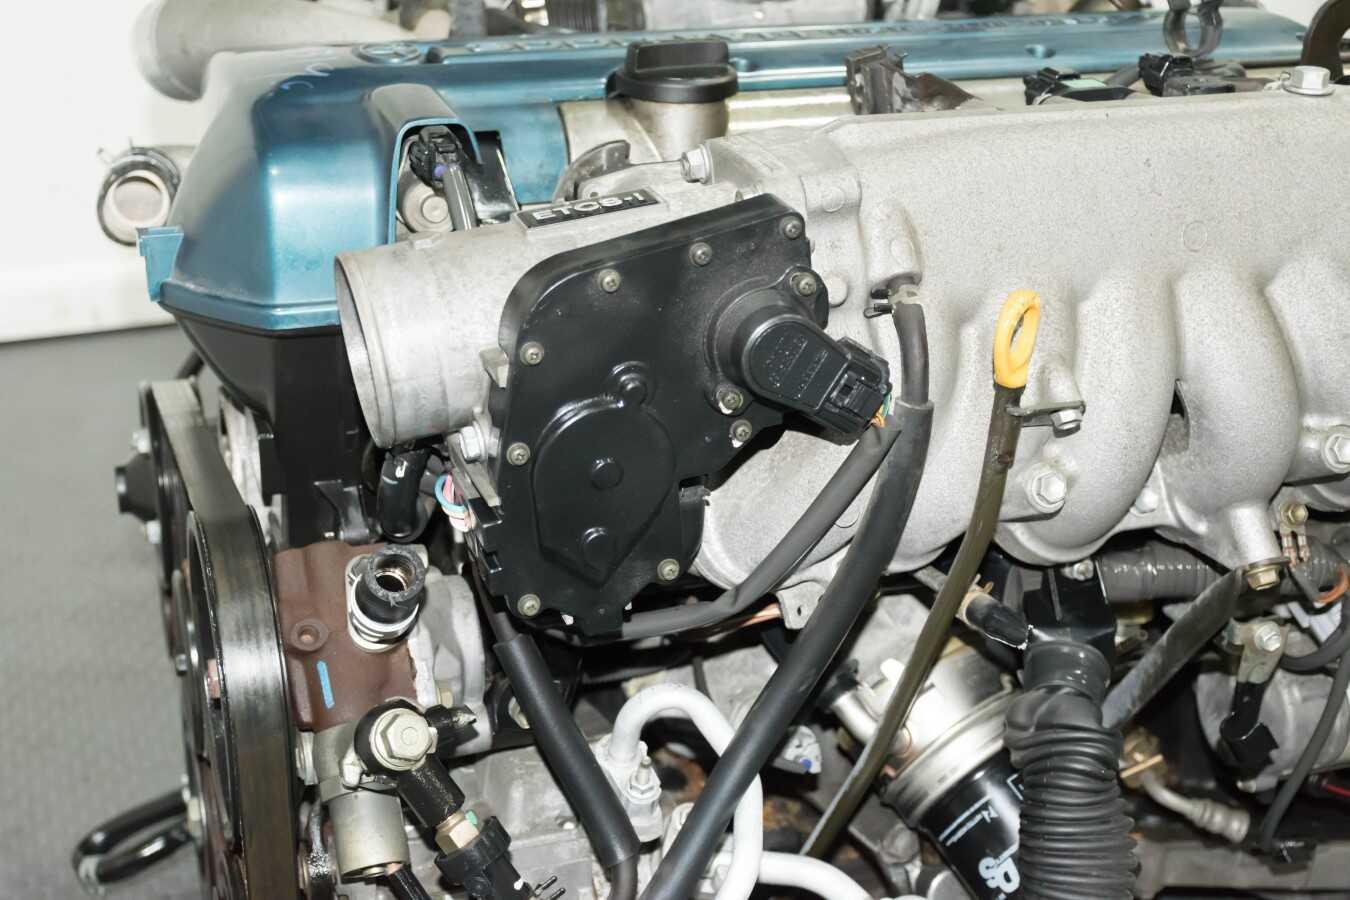 Clean Jdm Toyota Aristo 2jz Gte Vvti Complete Engine Auto Trans Wiring Harness Ecu Ignitor Chip Mafs